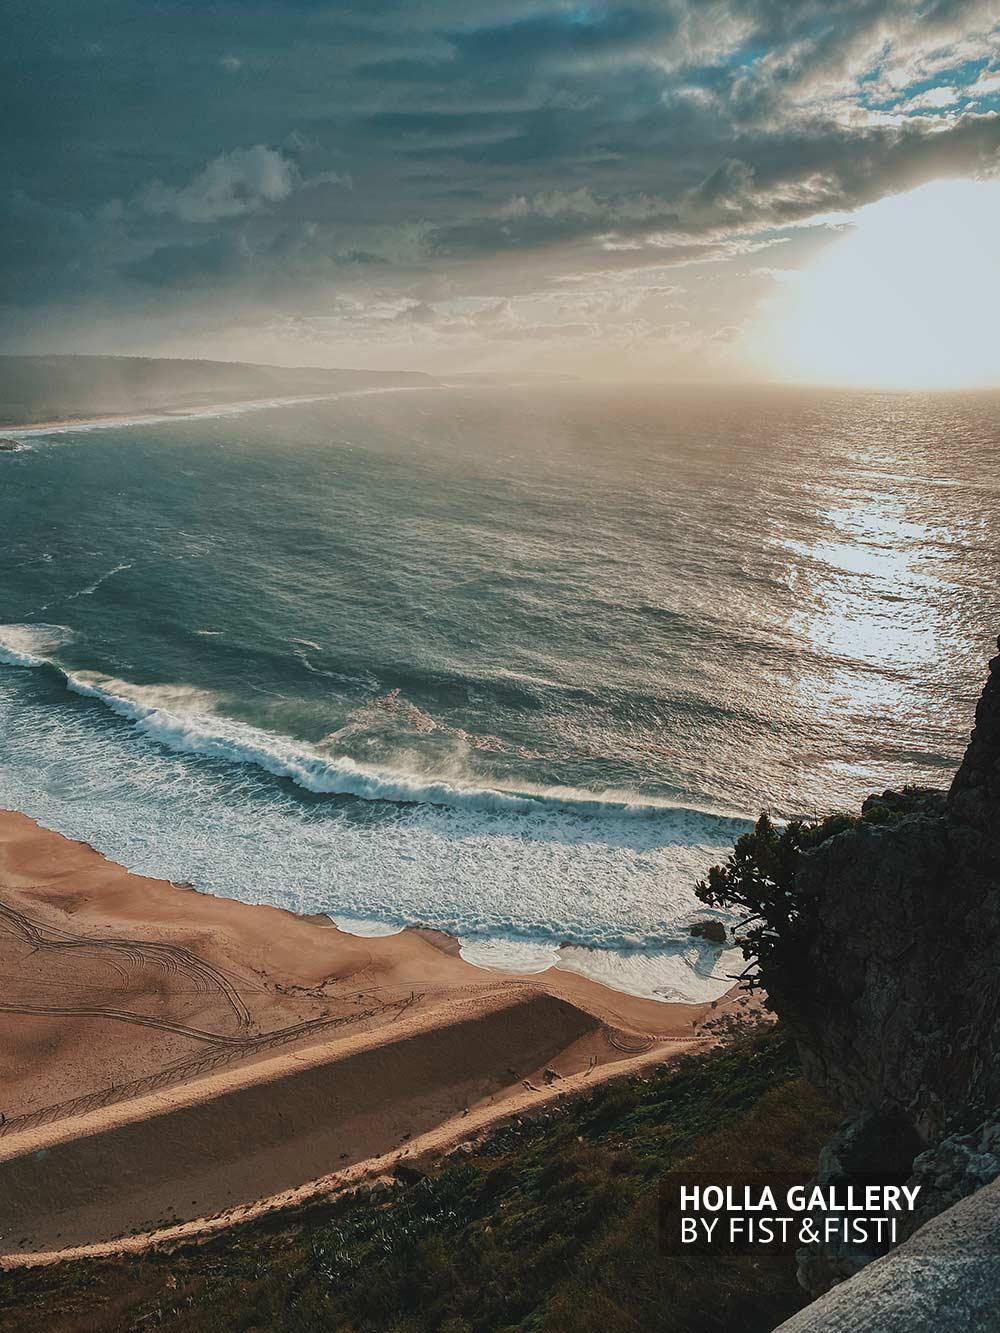 Панорамный вид на бухту у мыса Назаре. Португалия. Волны на закате